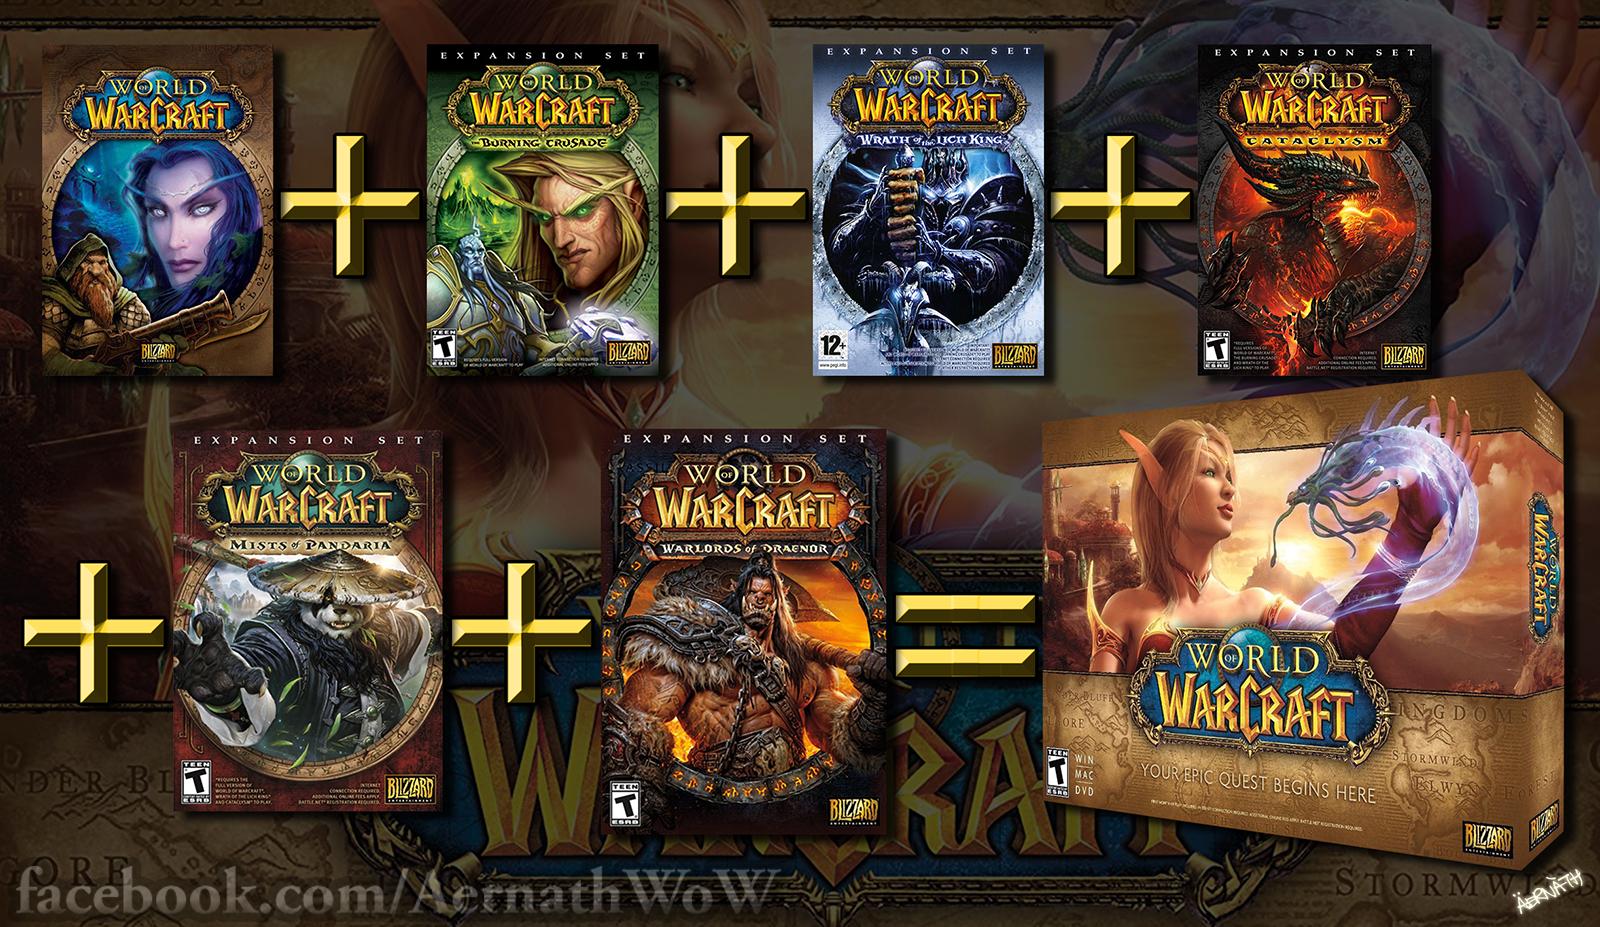 World of Warcraftda bir eklenti nedir